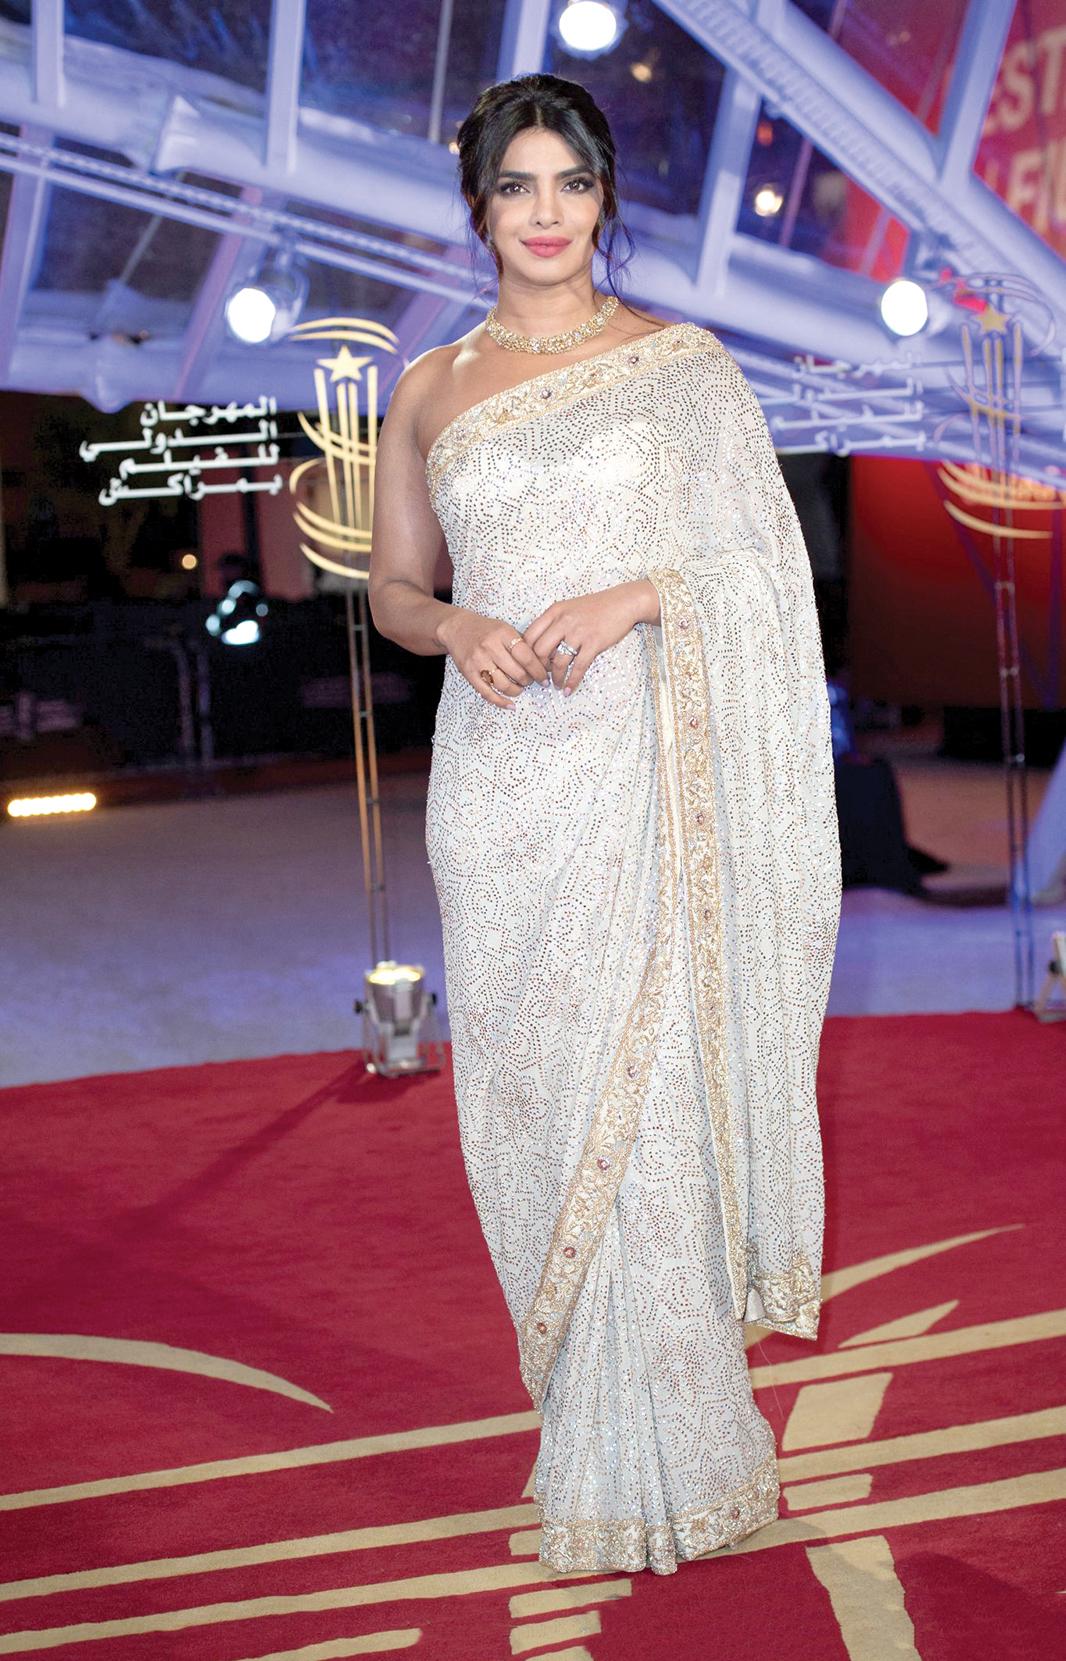 Priyanka Chopra in Abu Jani Sandeep Khosla